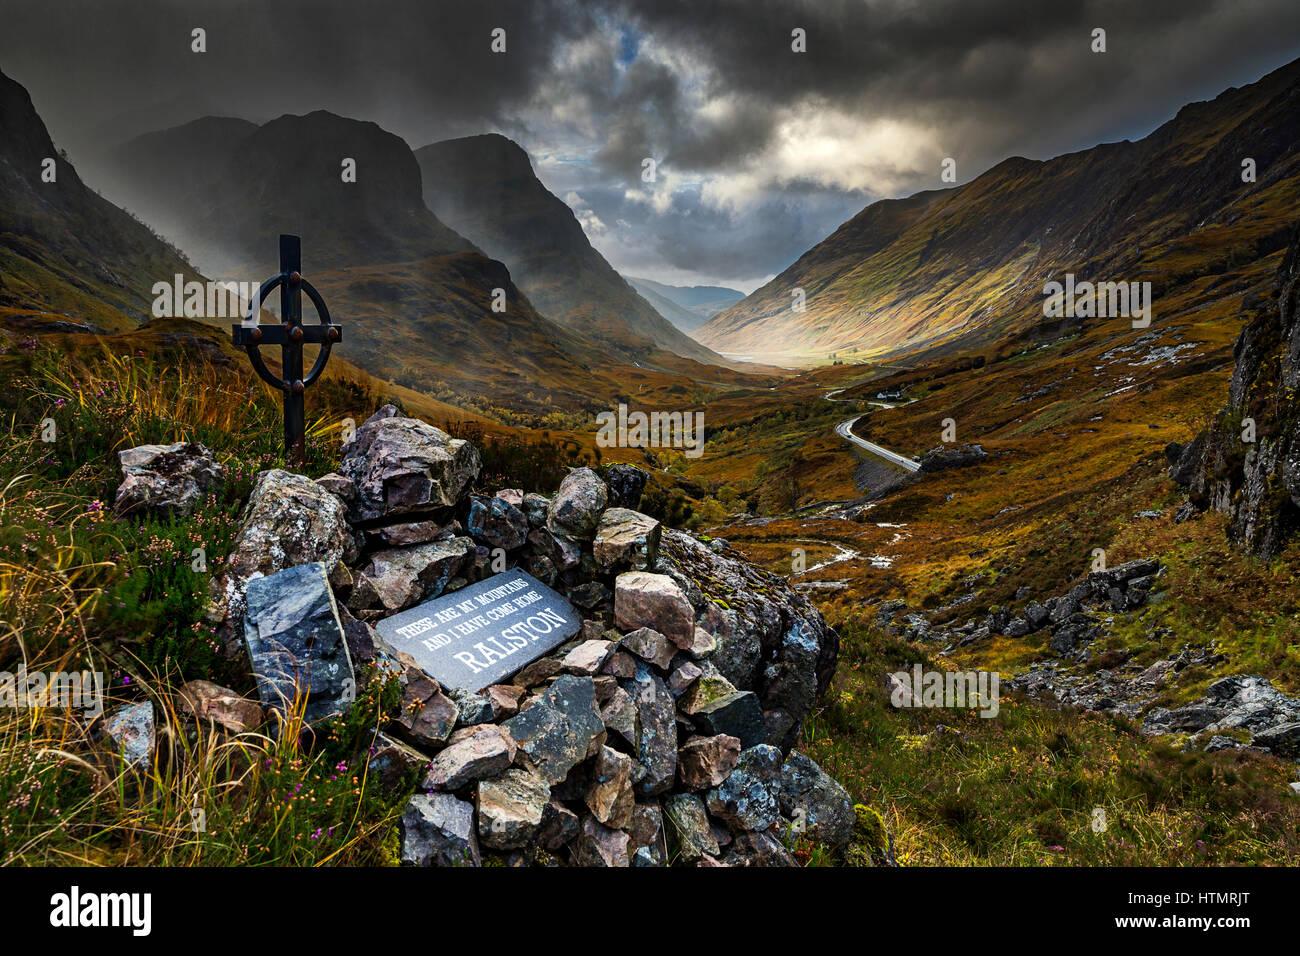 Ralston Cairn and Three Sisters, Glen Coe, Scotland - Stock Image